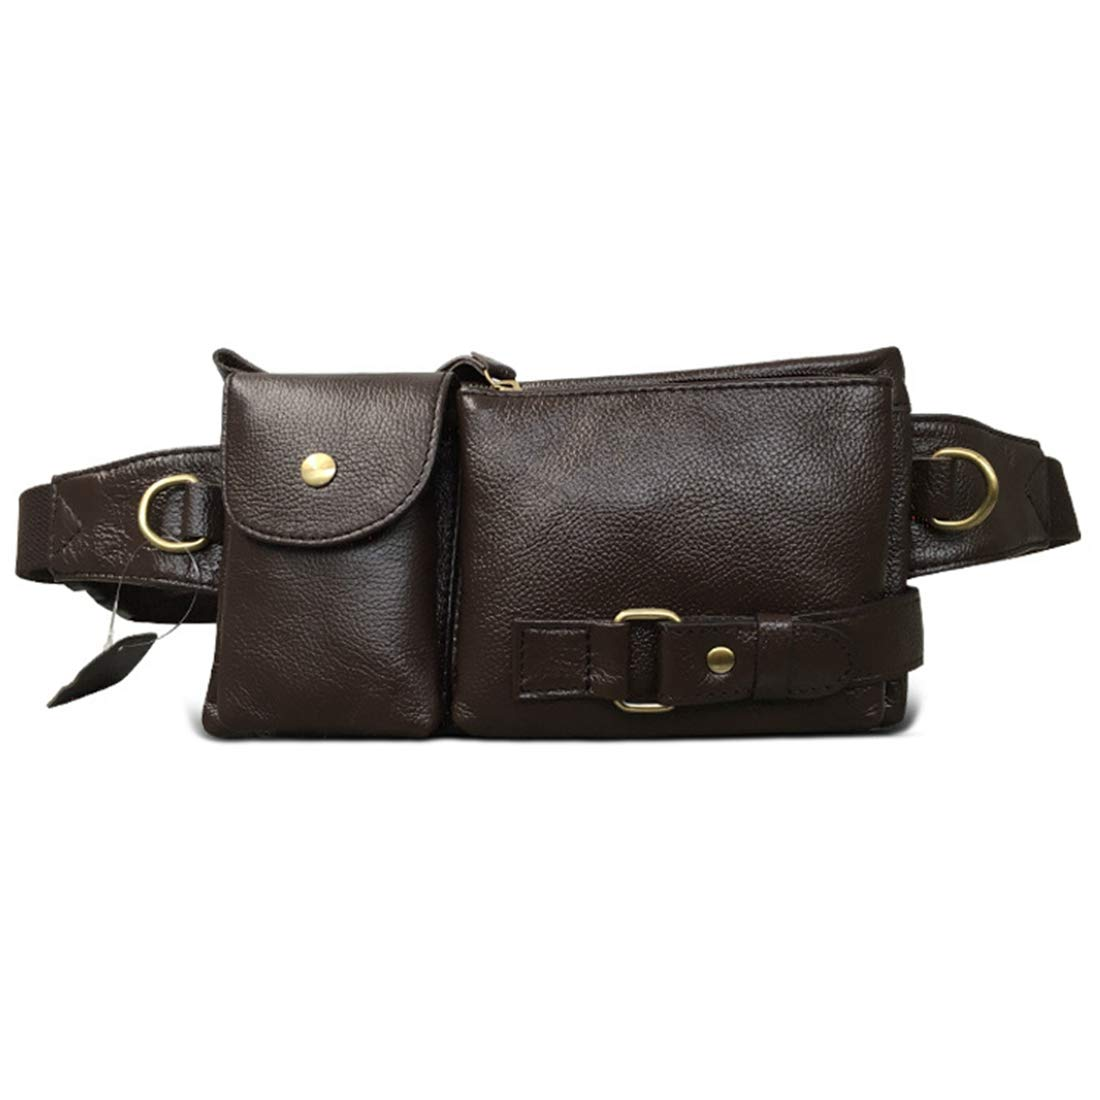 Color : Coffee Color RABILTY Belt Holster Bag Fanny Waist Pack Crossbody Bag for Men Boy Black Cowhide Travel Money Belt RFID Blocking